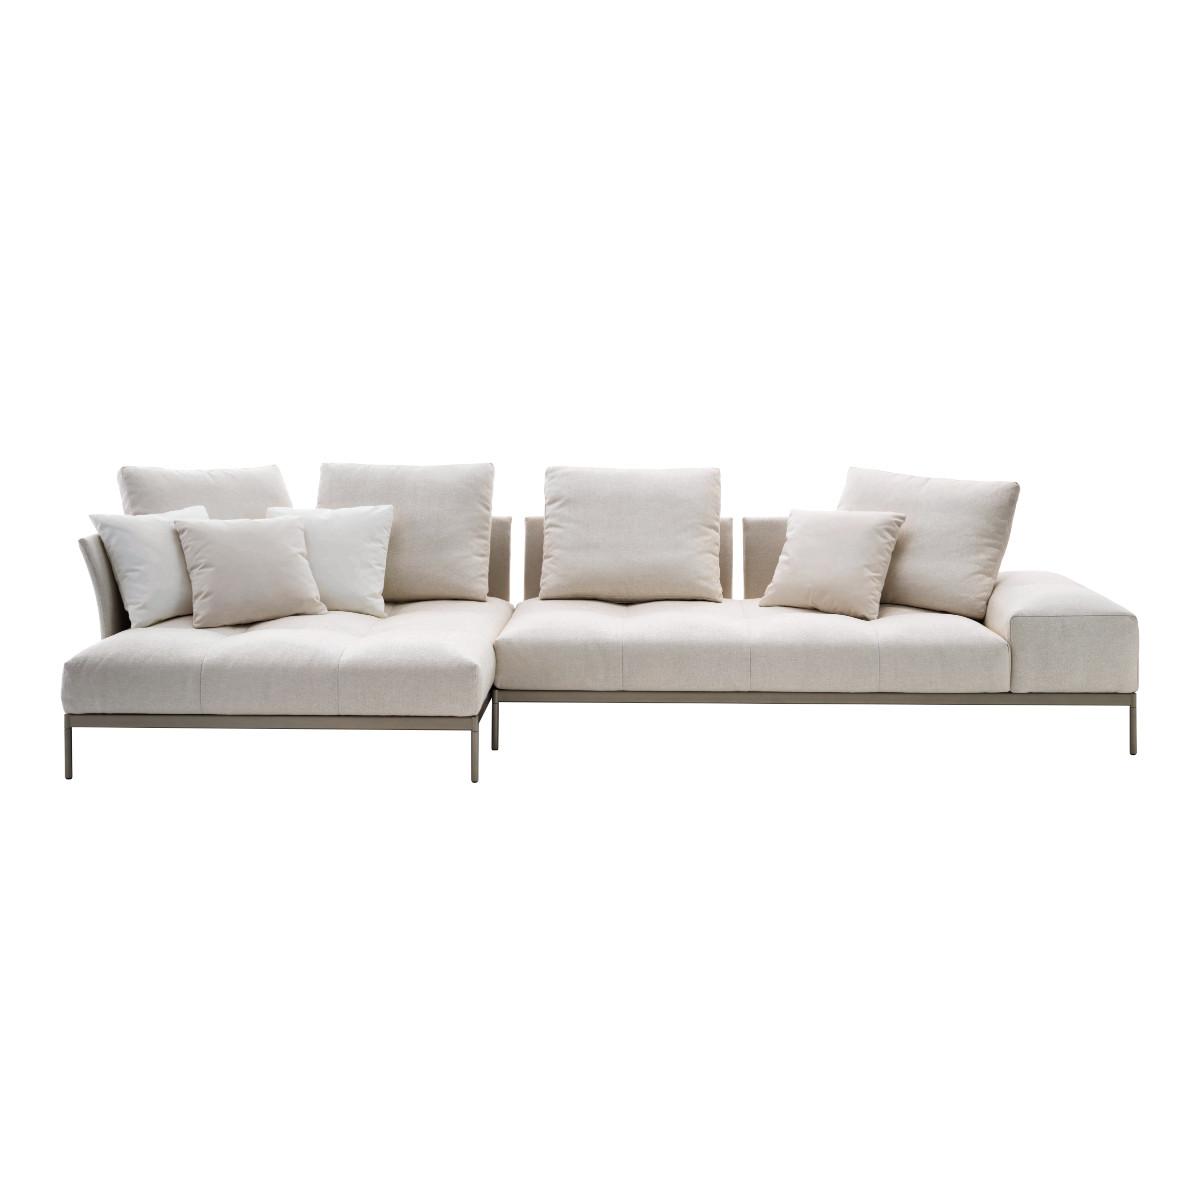 Sofa modułowa Pixel Light